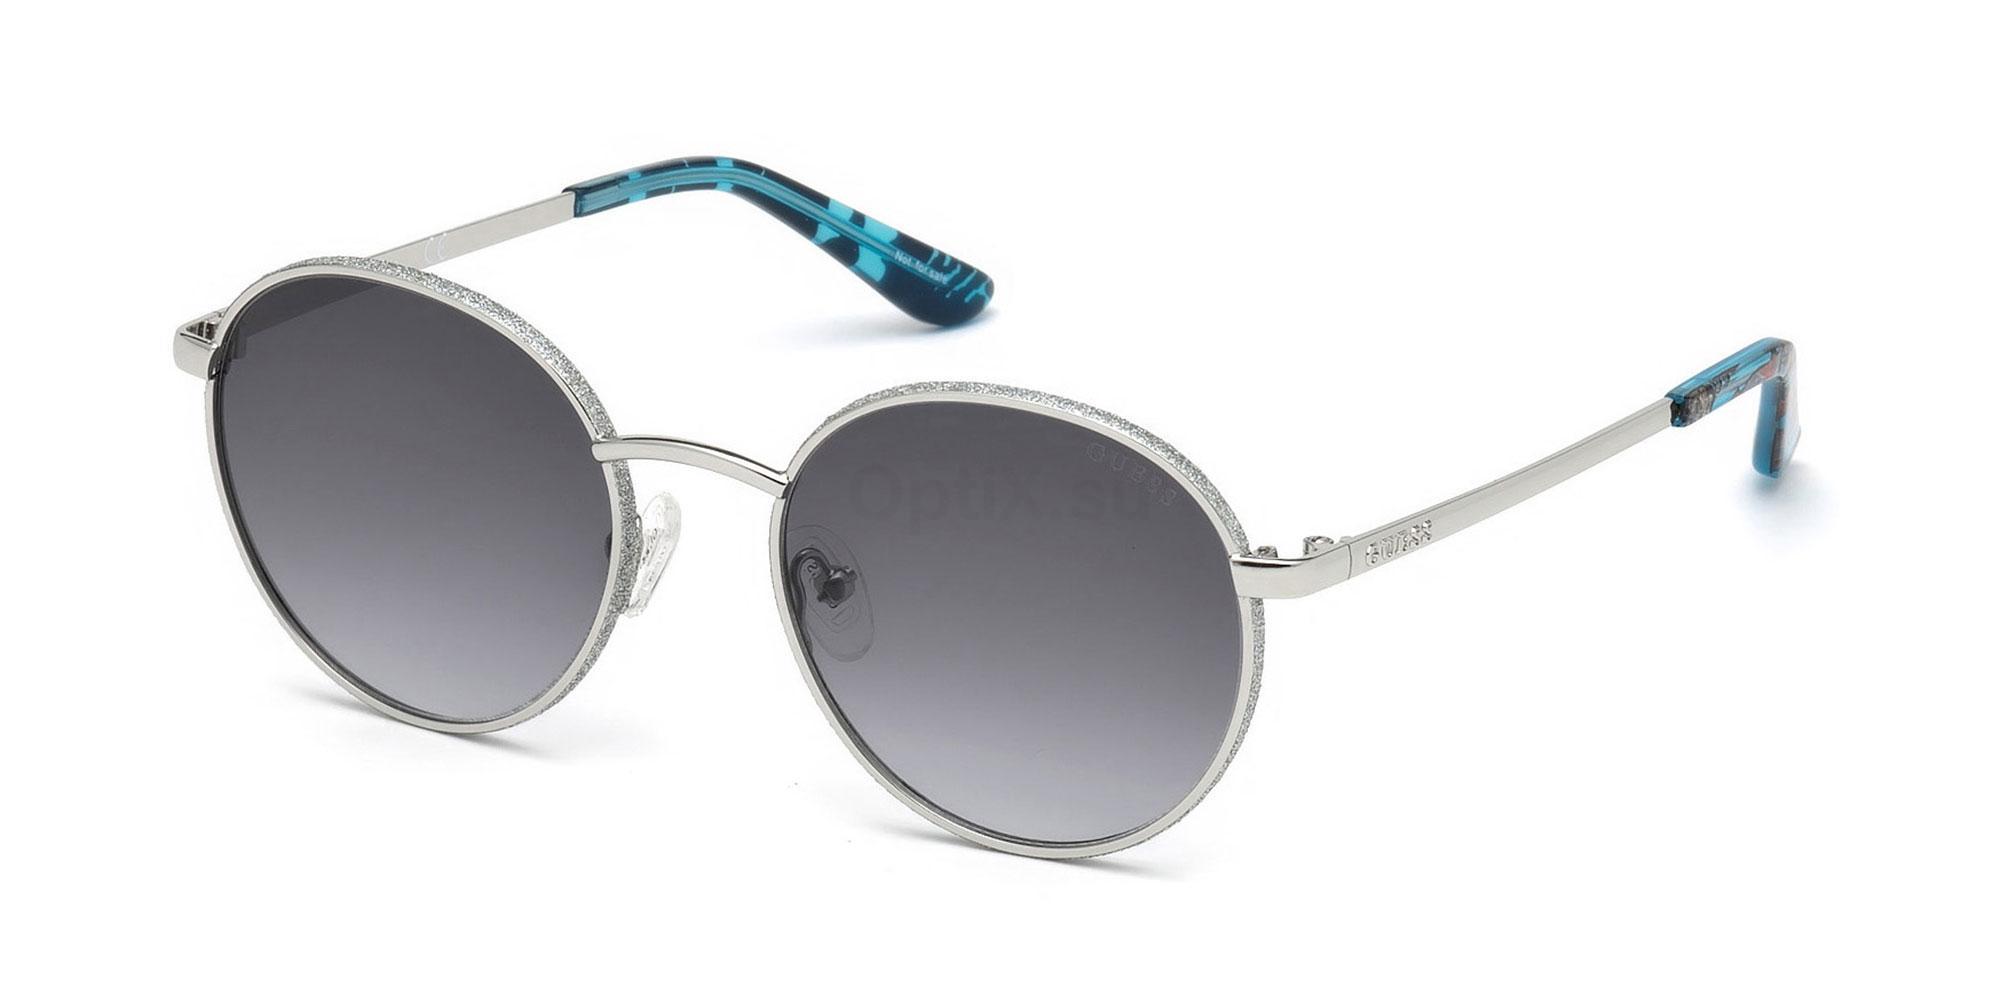 10B GU7556 Sunglasses, Guess